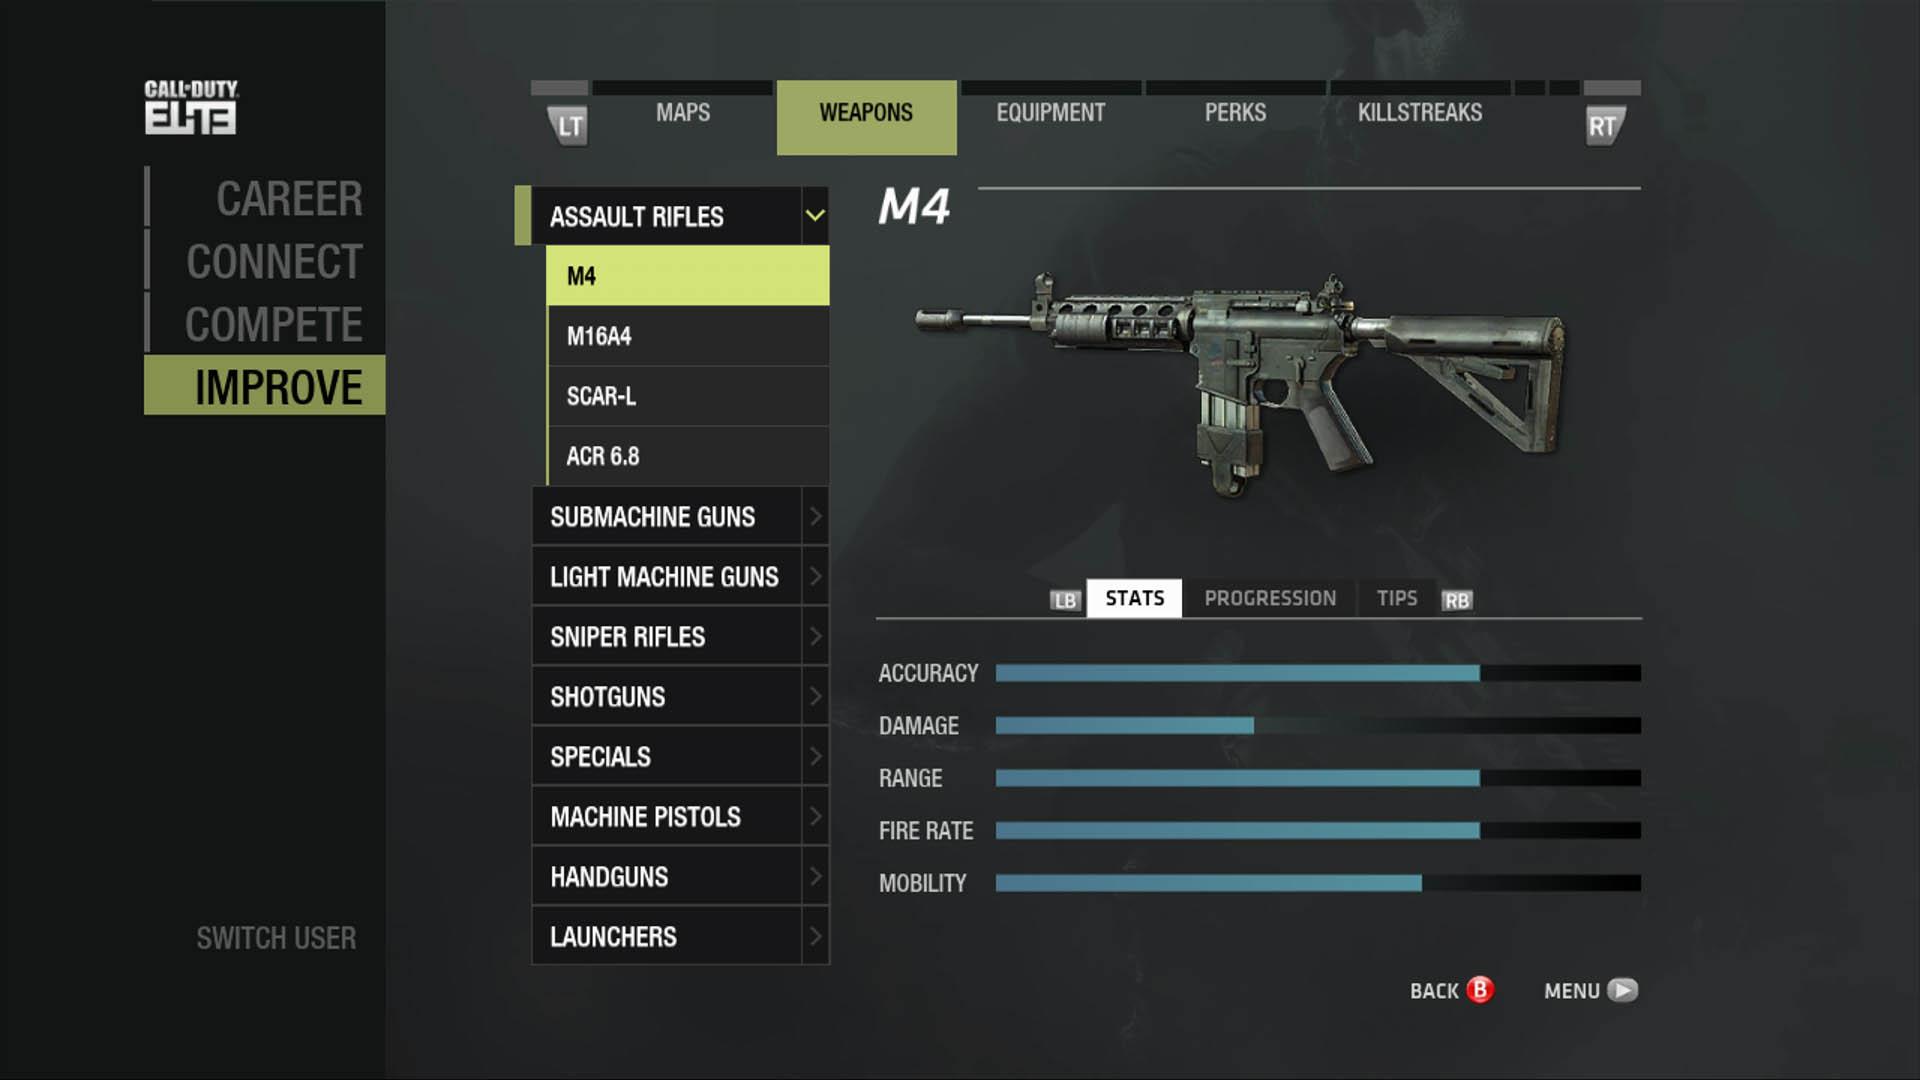 Call of Duty Elite láká v novém videu 50860